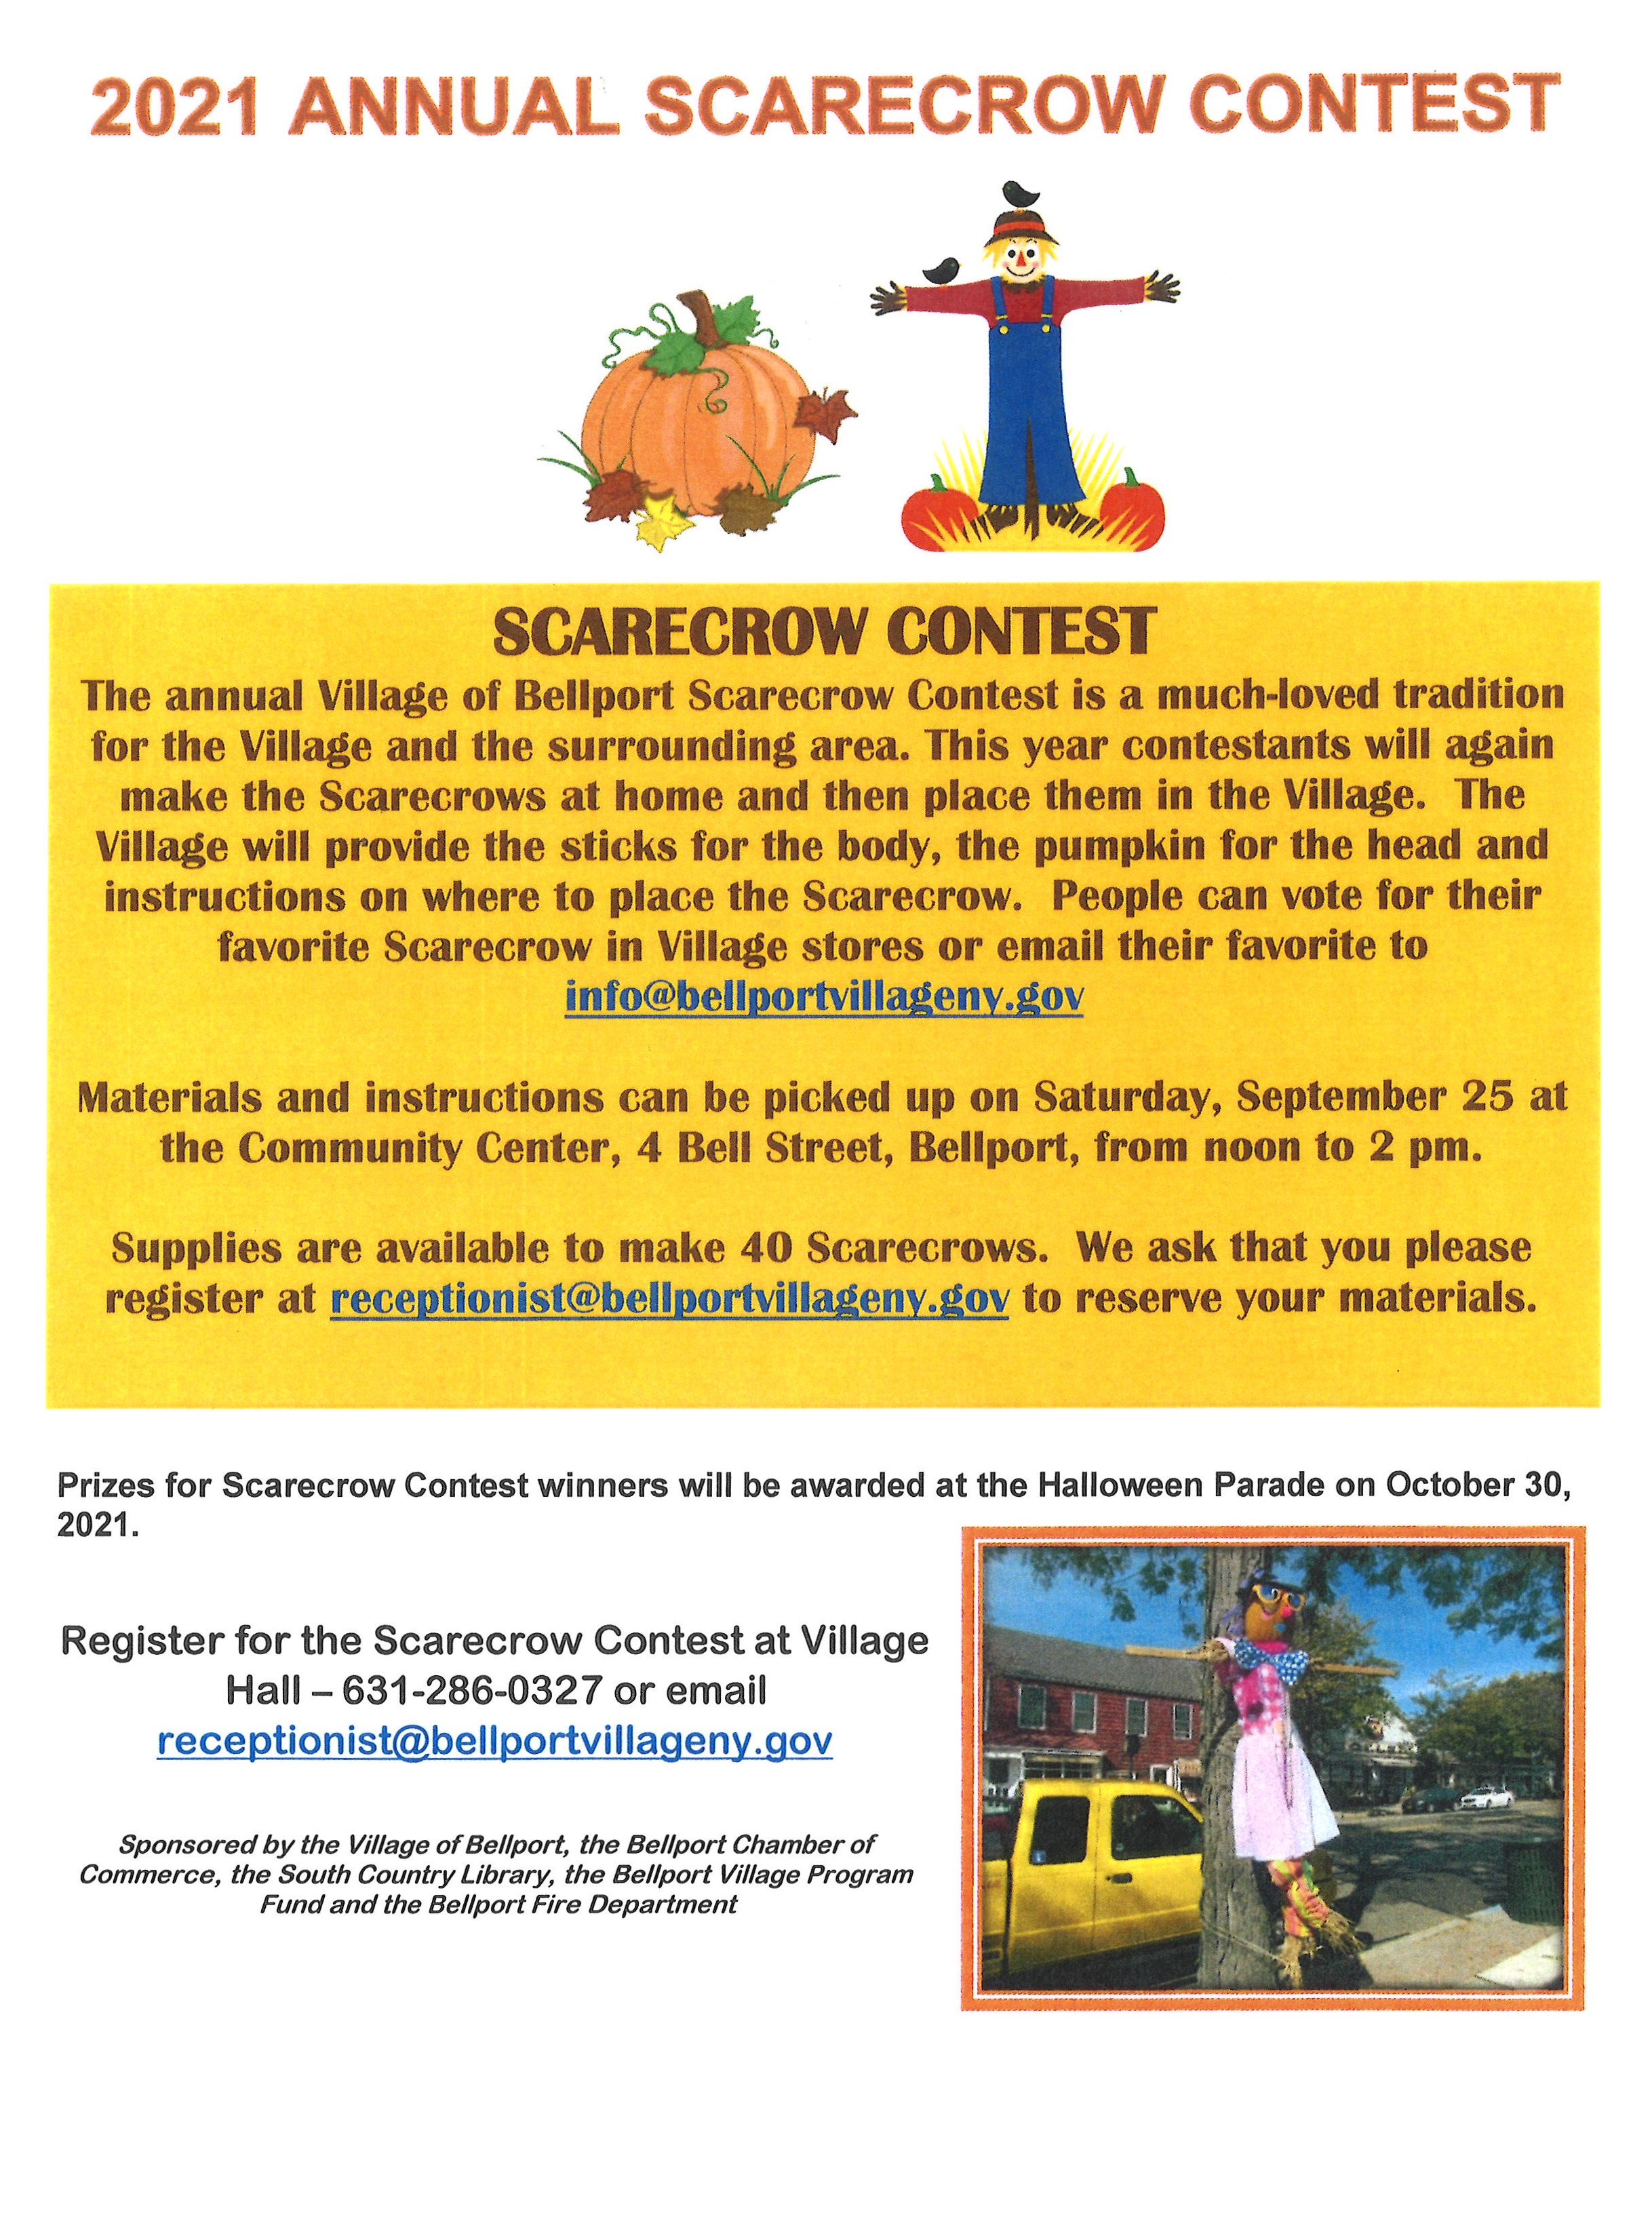 2021 Annual Scarecrow Contest